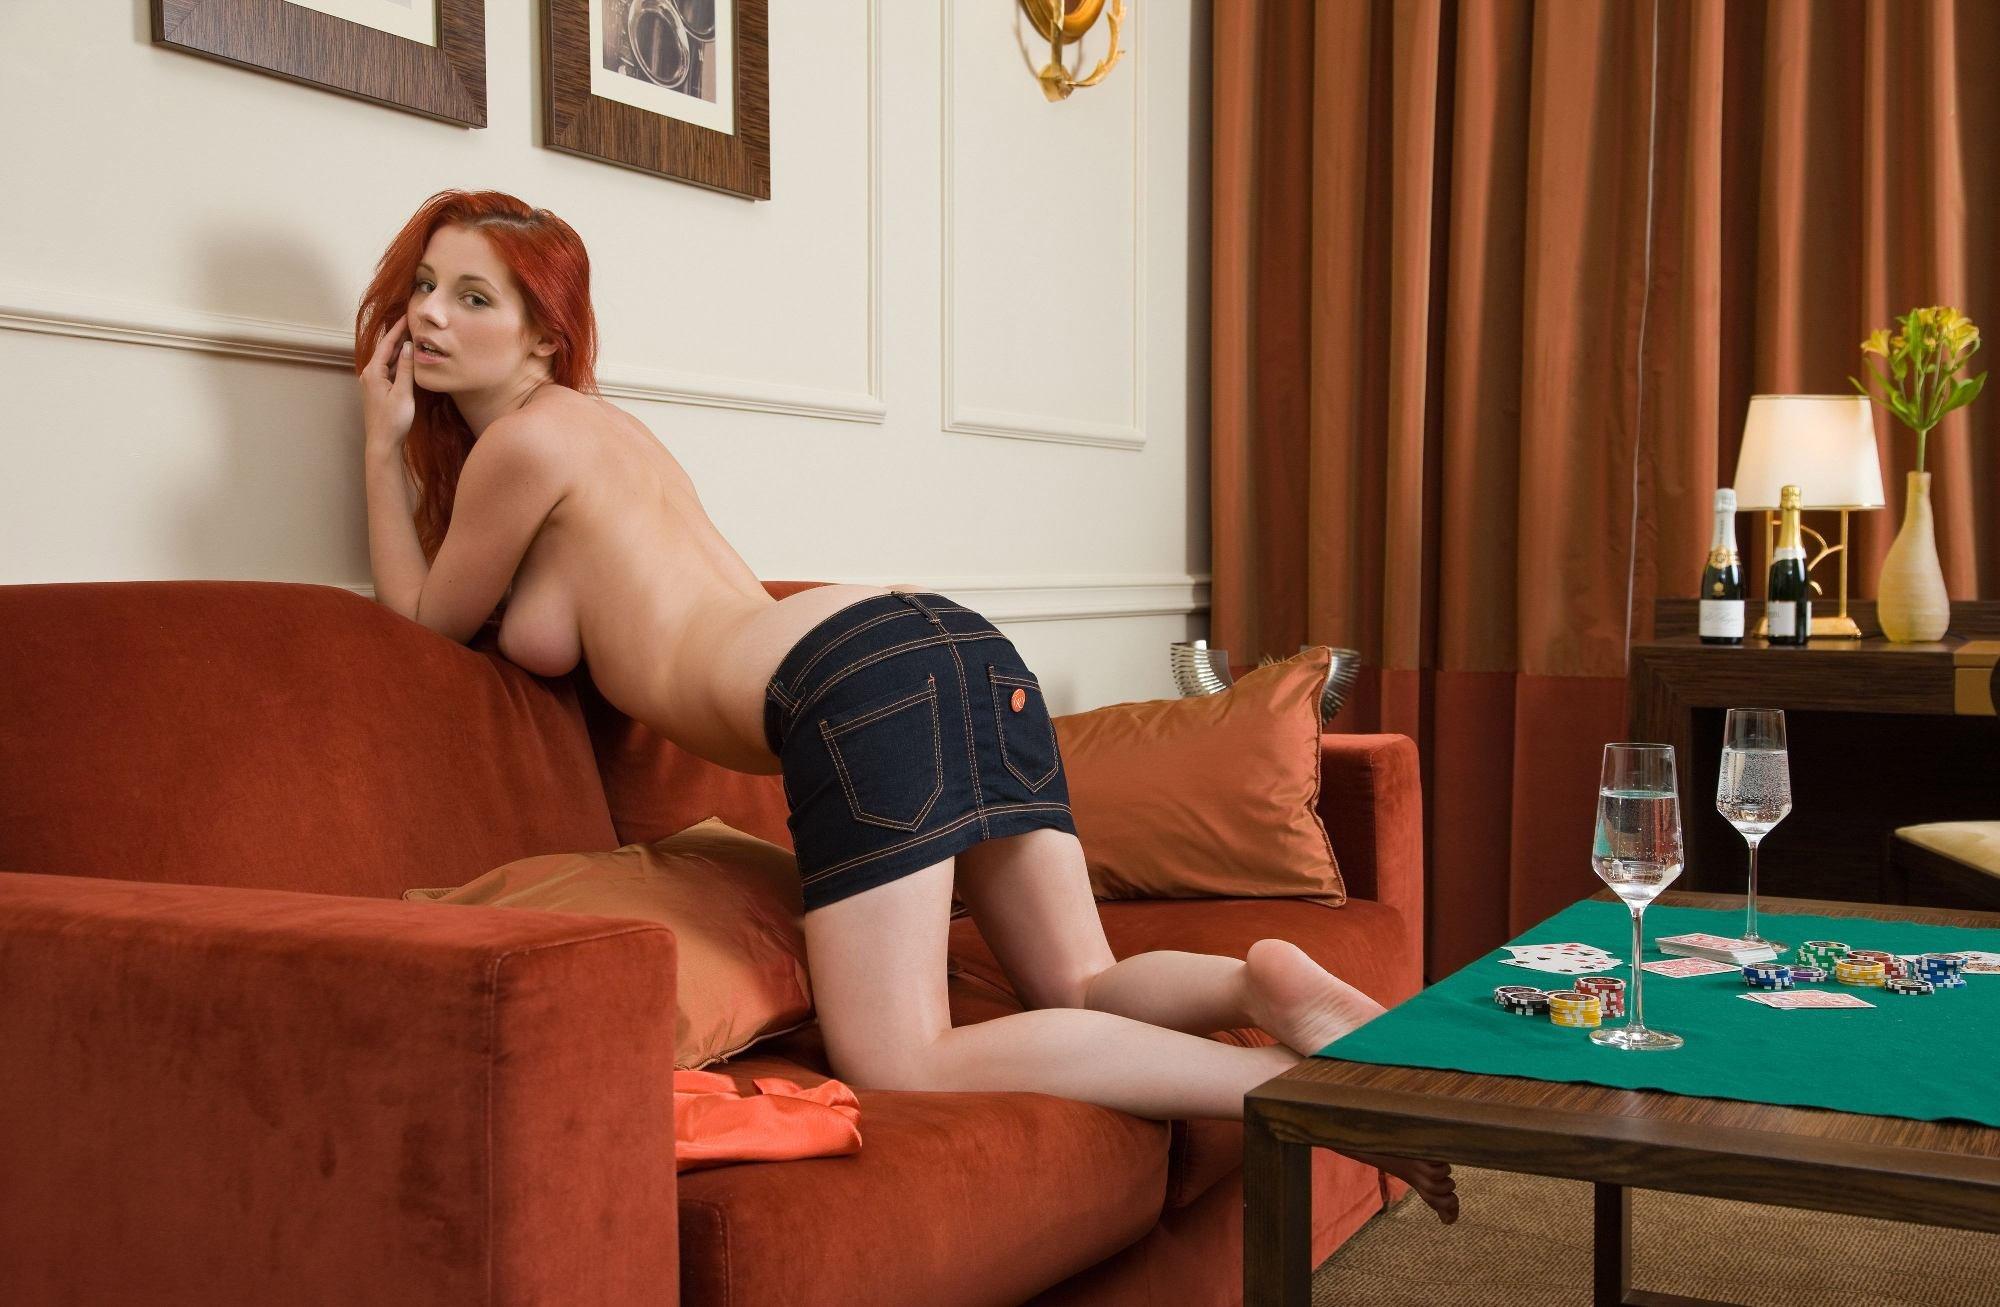 tin-smotret-eroticheskie-igri-na-razdevanie-video-klassno-dvigaet